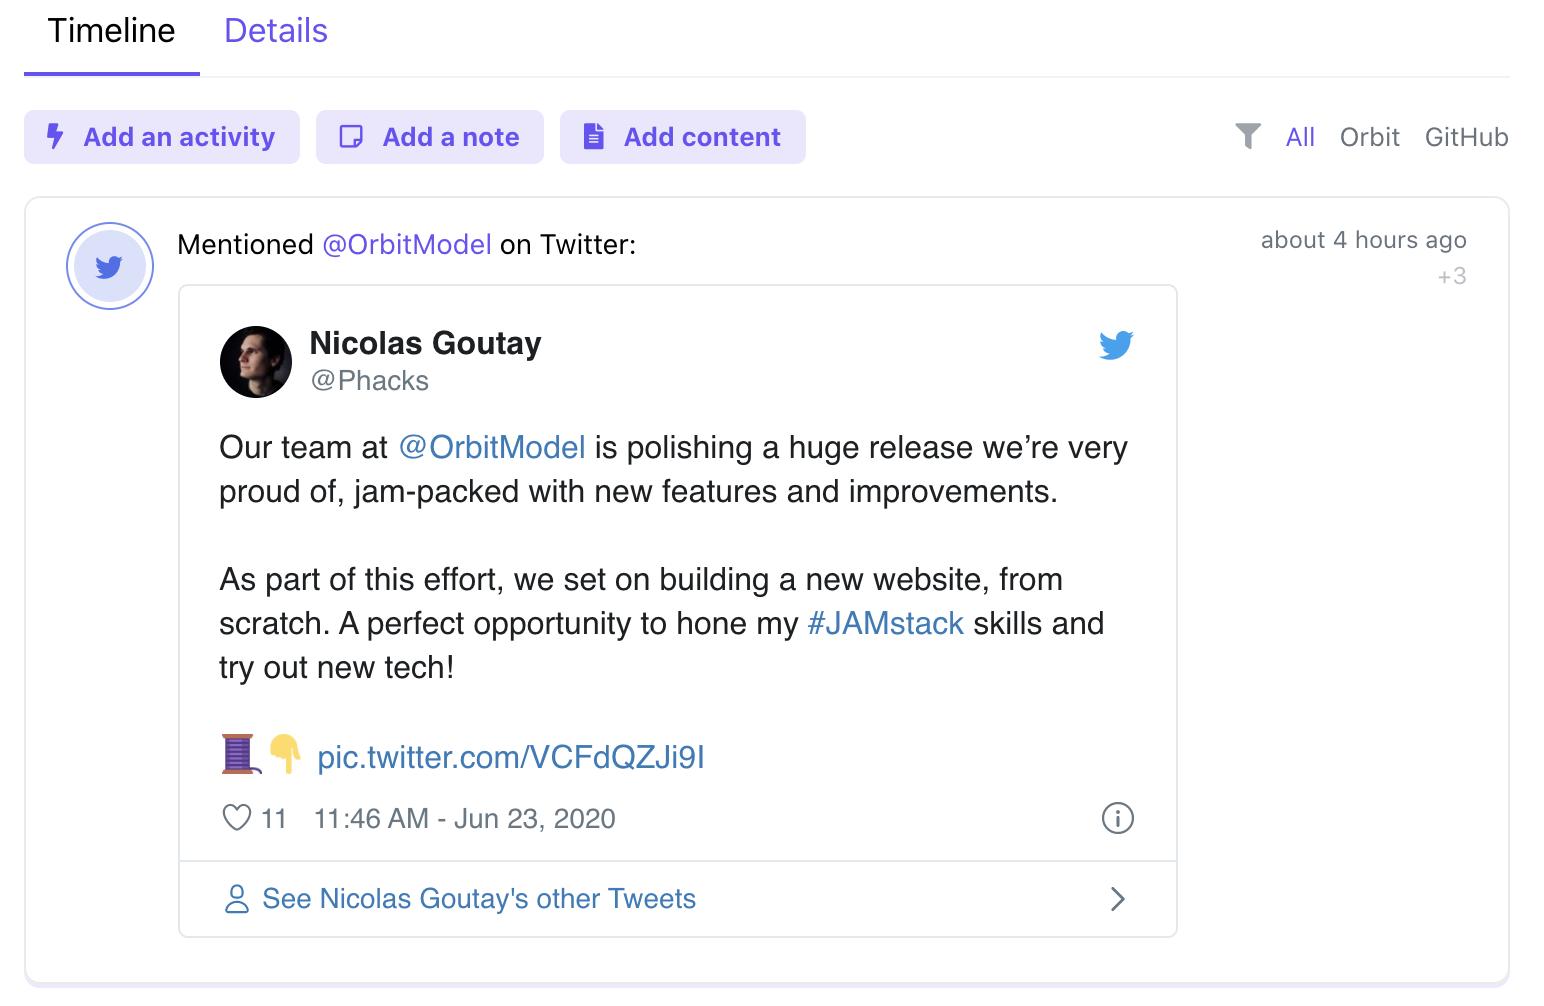 Screenshot of the Orbit Twitter integration